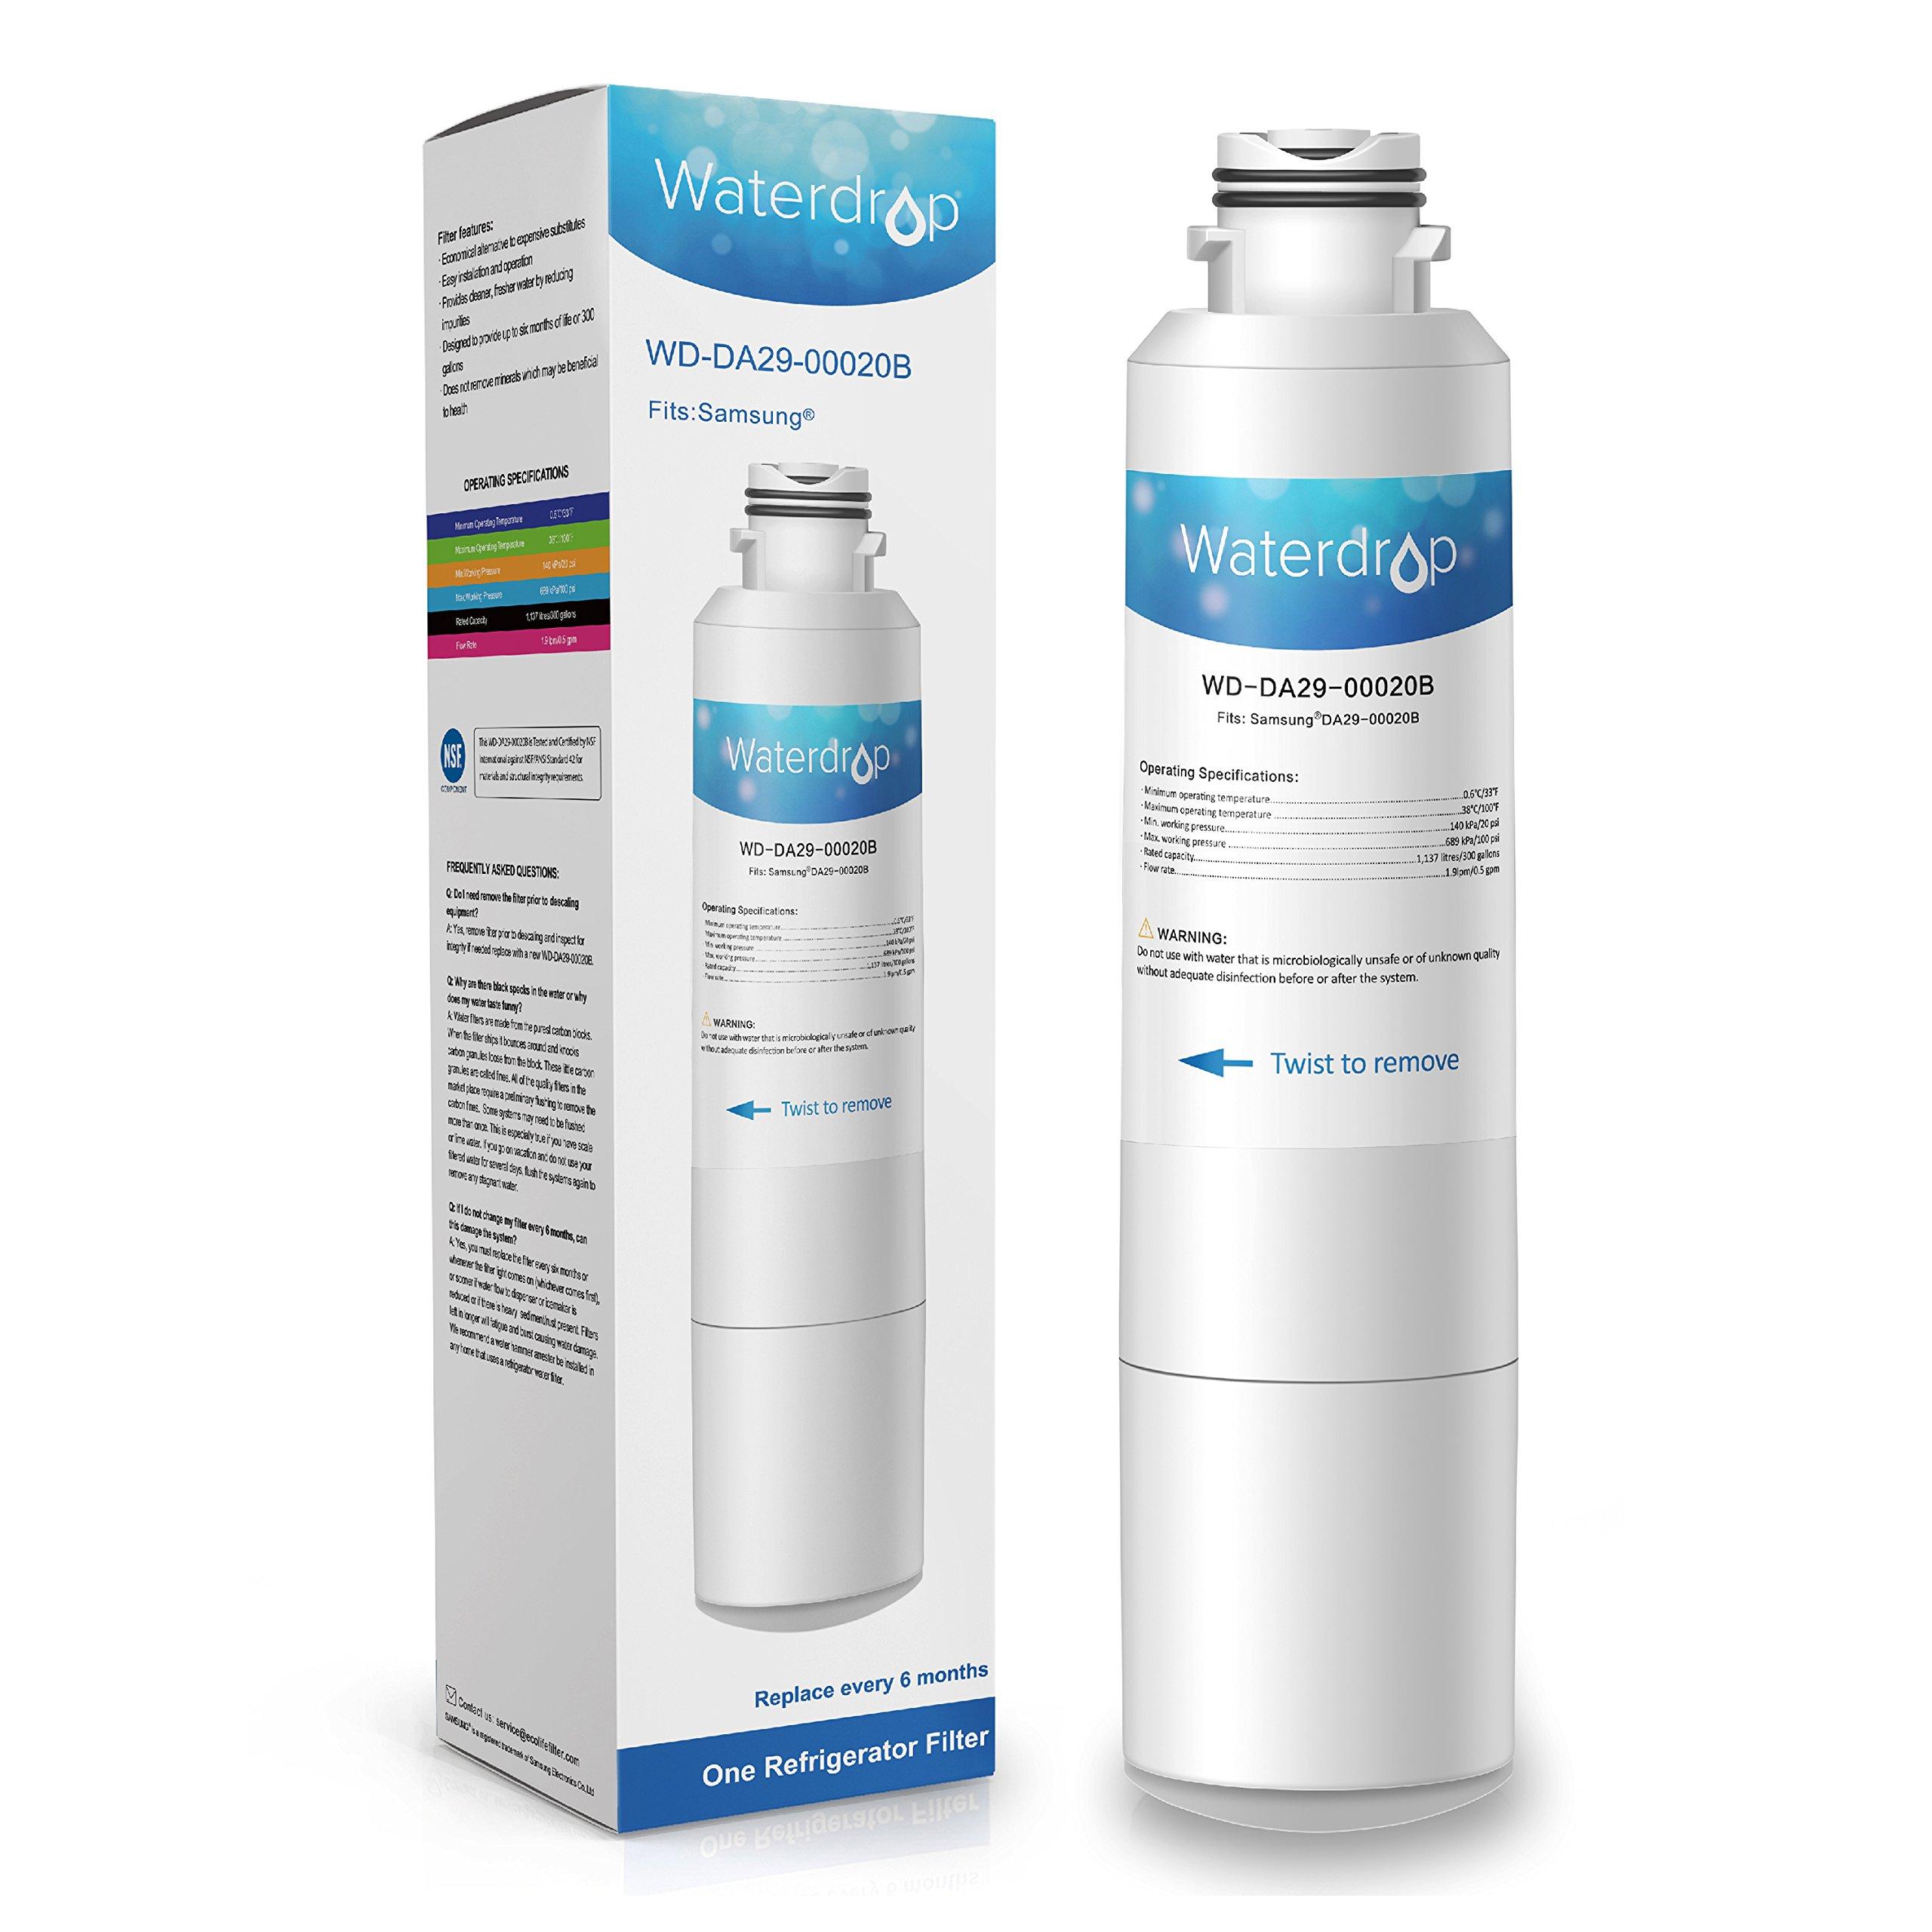 Waterdrop DA29-00020B Refrigerator Water Filter Replacement for Samsung DA29-00020B, DA29-00020A, HAF-CIN/EXP, 46-9101